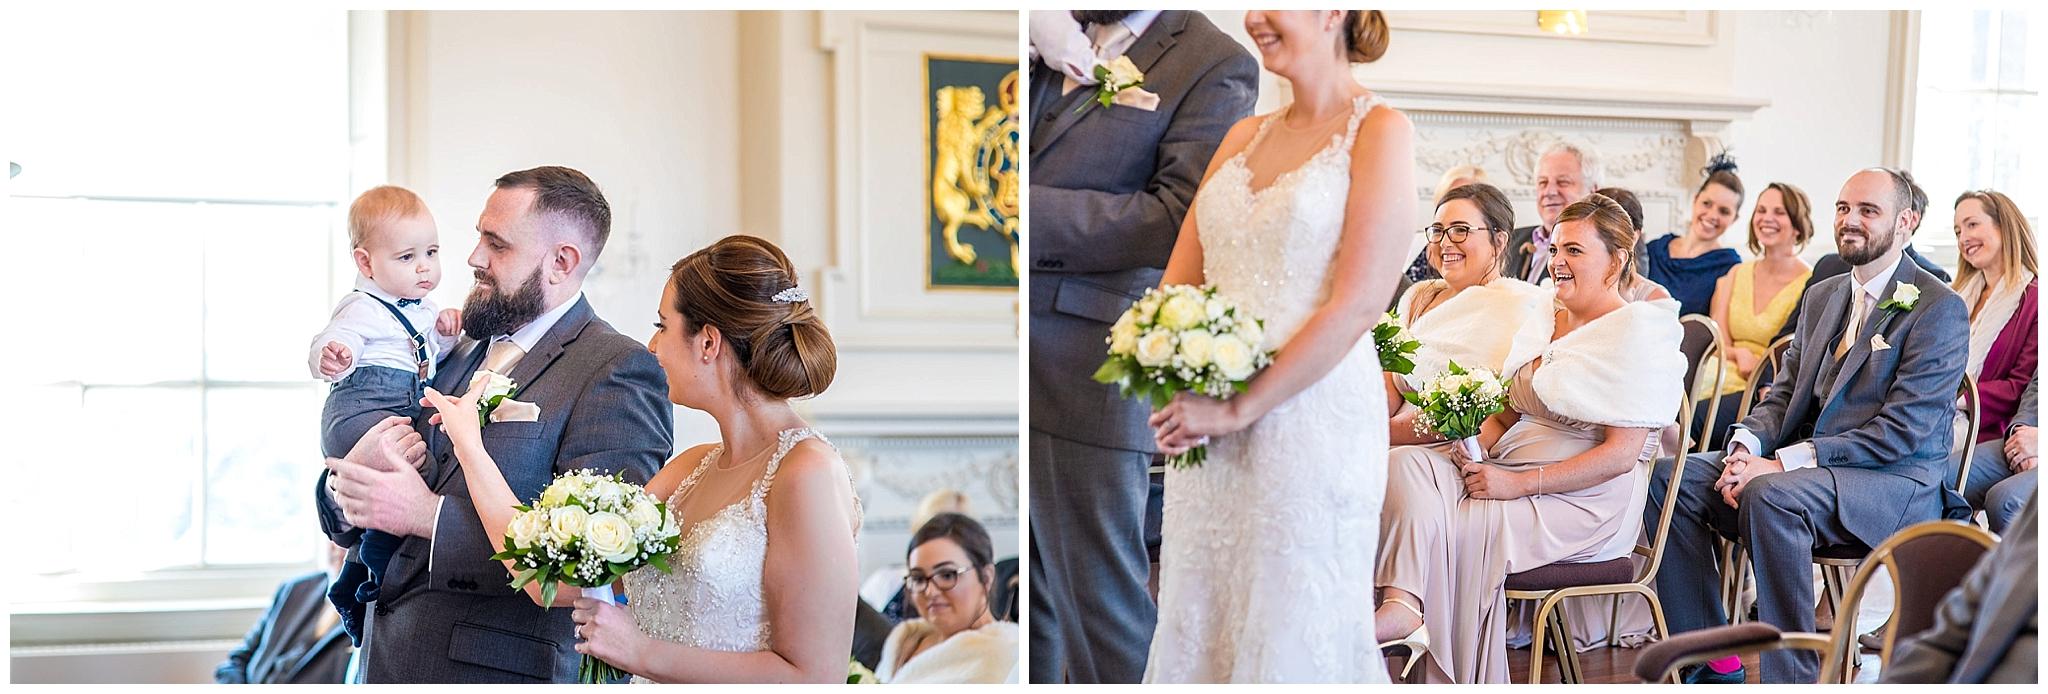 Lisa-&-Michael-Wedding-Guildhall-&-Hotel-Du-Vin-43